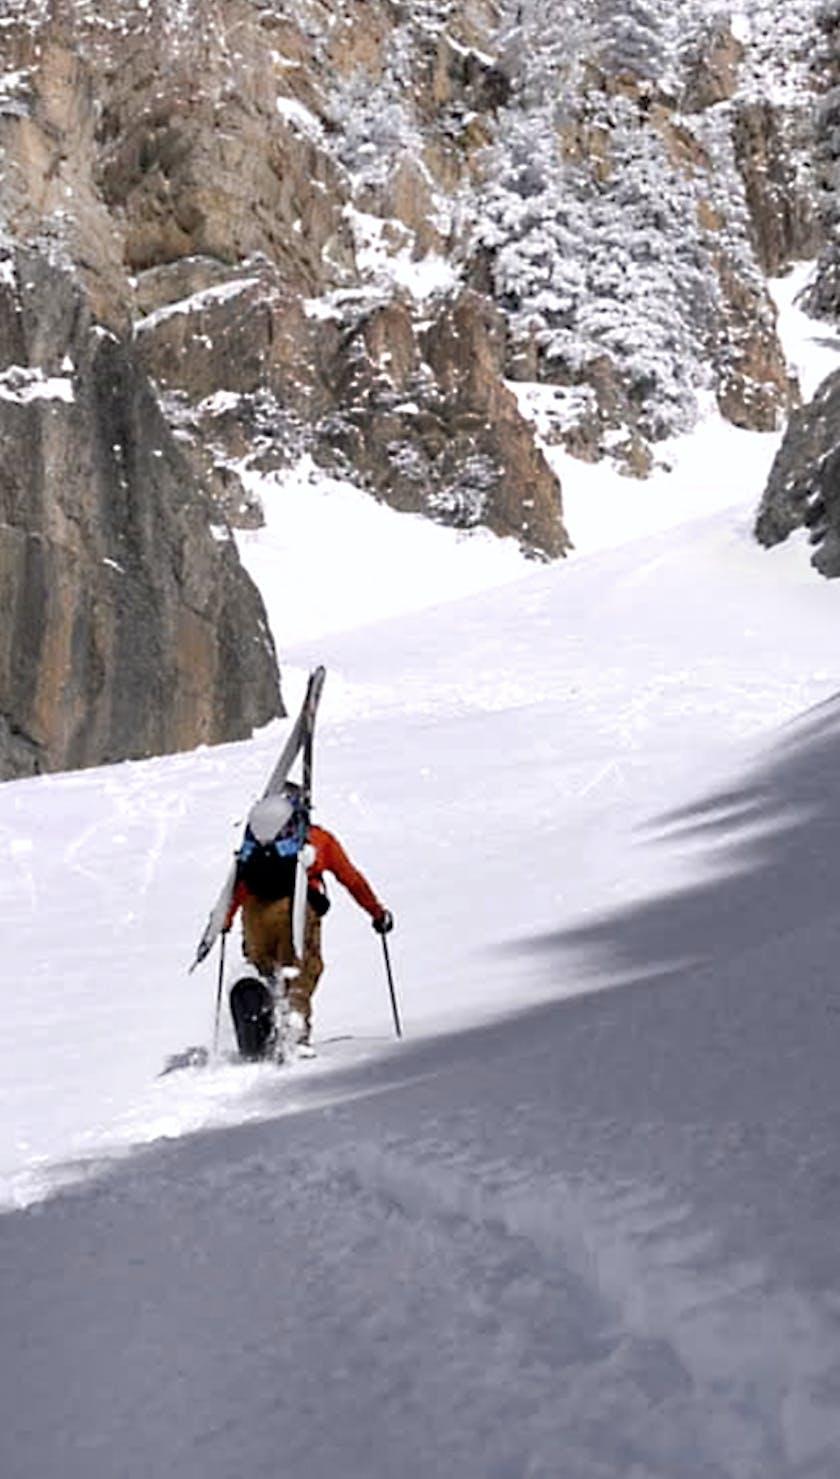 Skier trekking up mountain